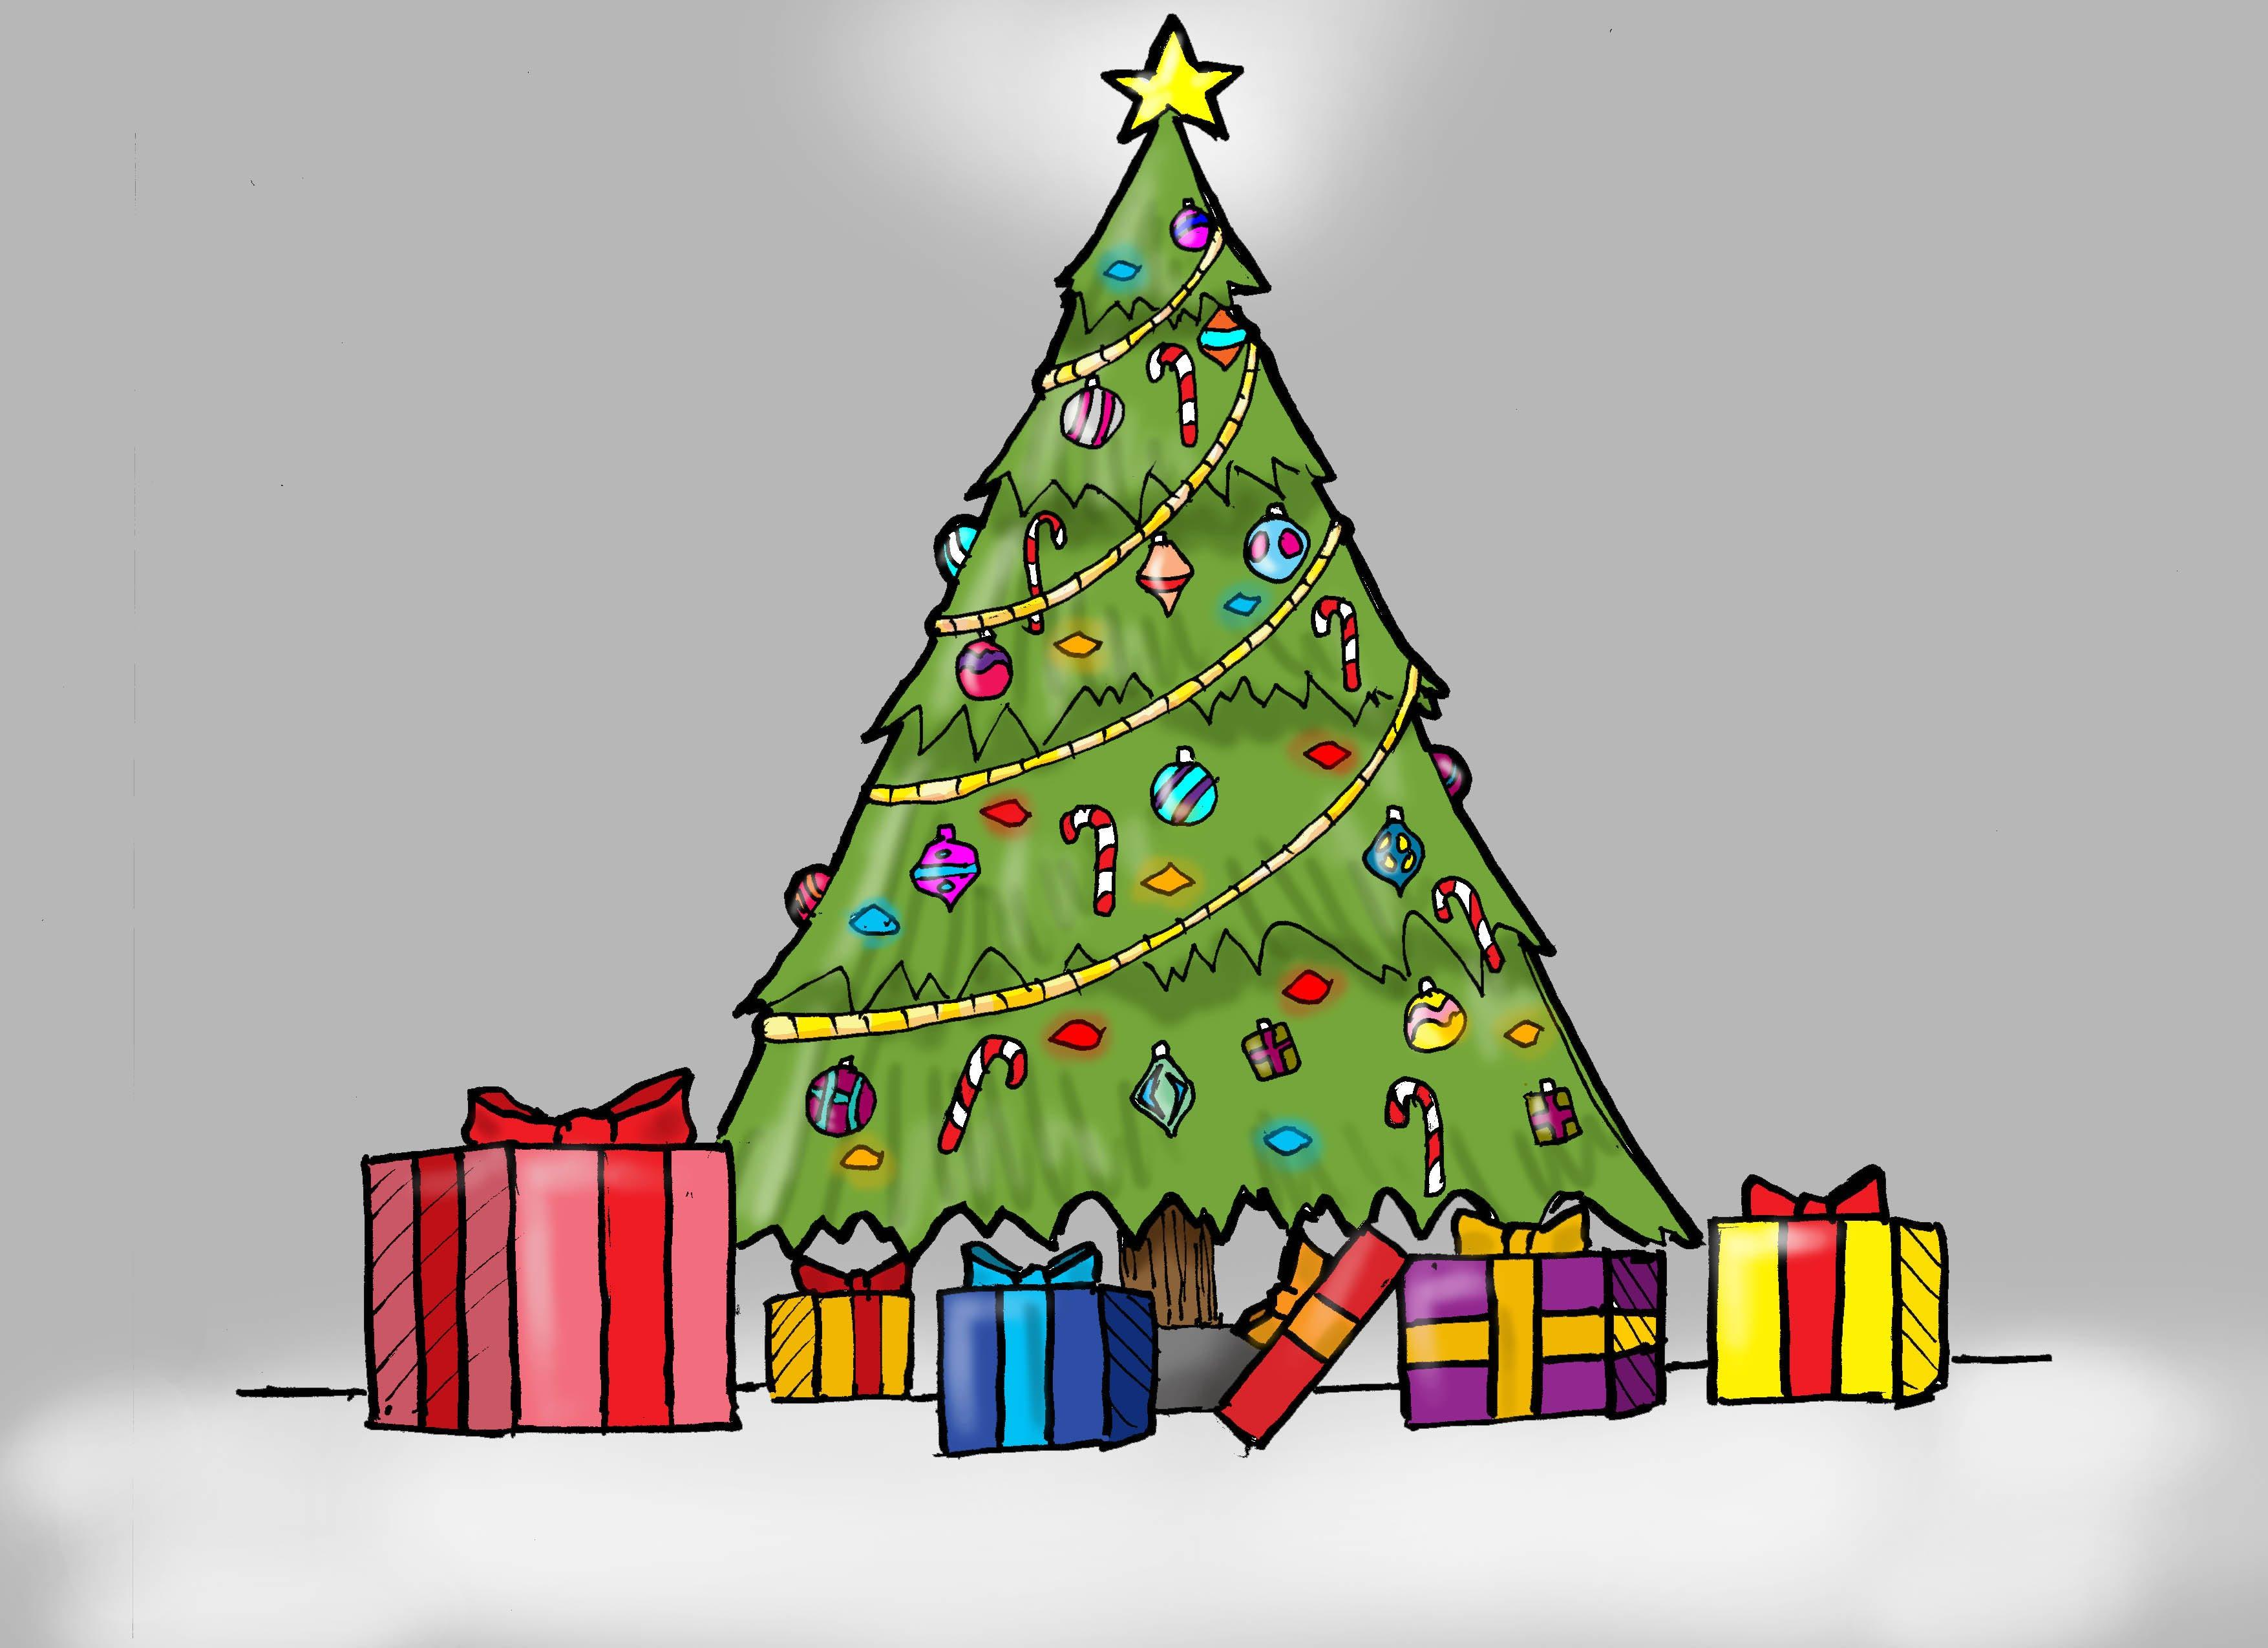 3509x2550 Valuable Design Ideas A Christmas Tree Miracle Shop Song Cartoon